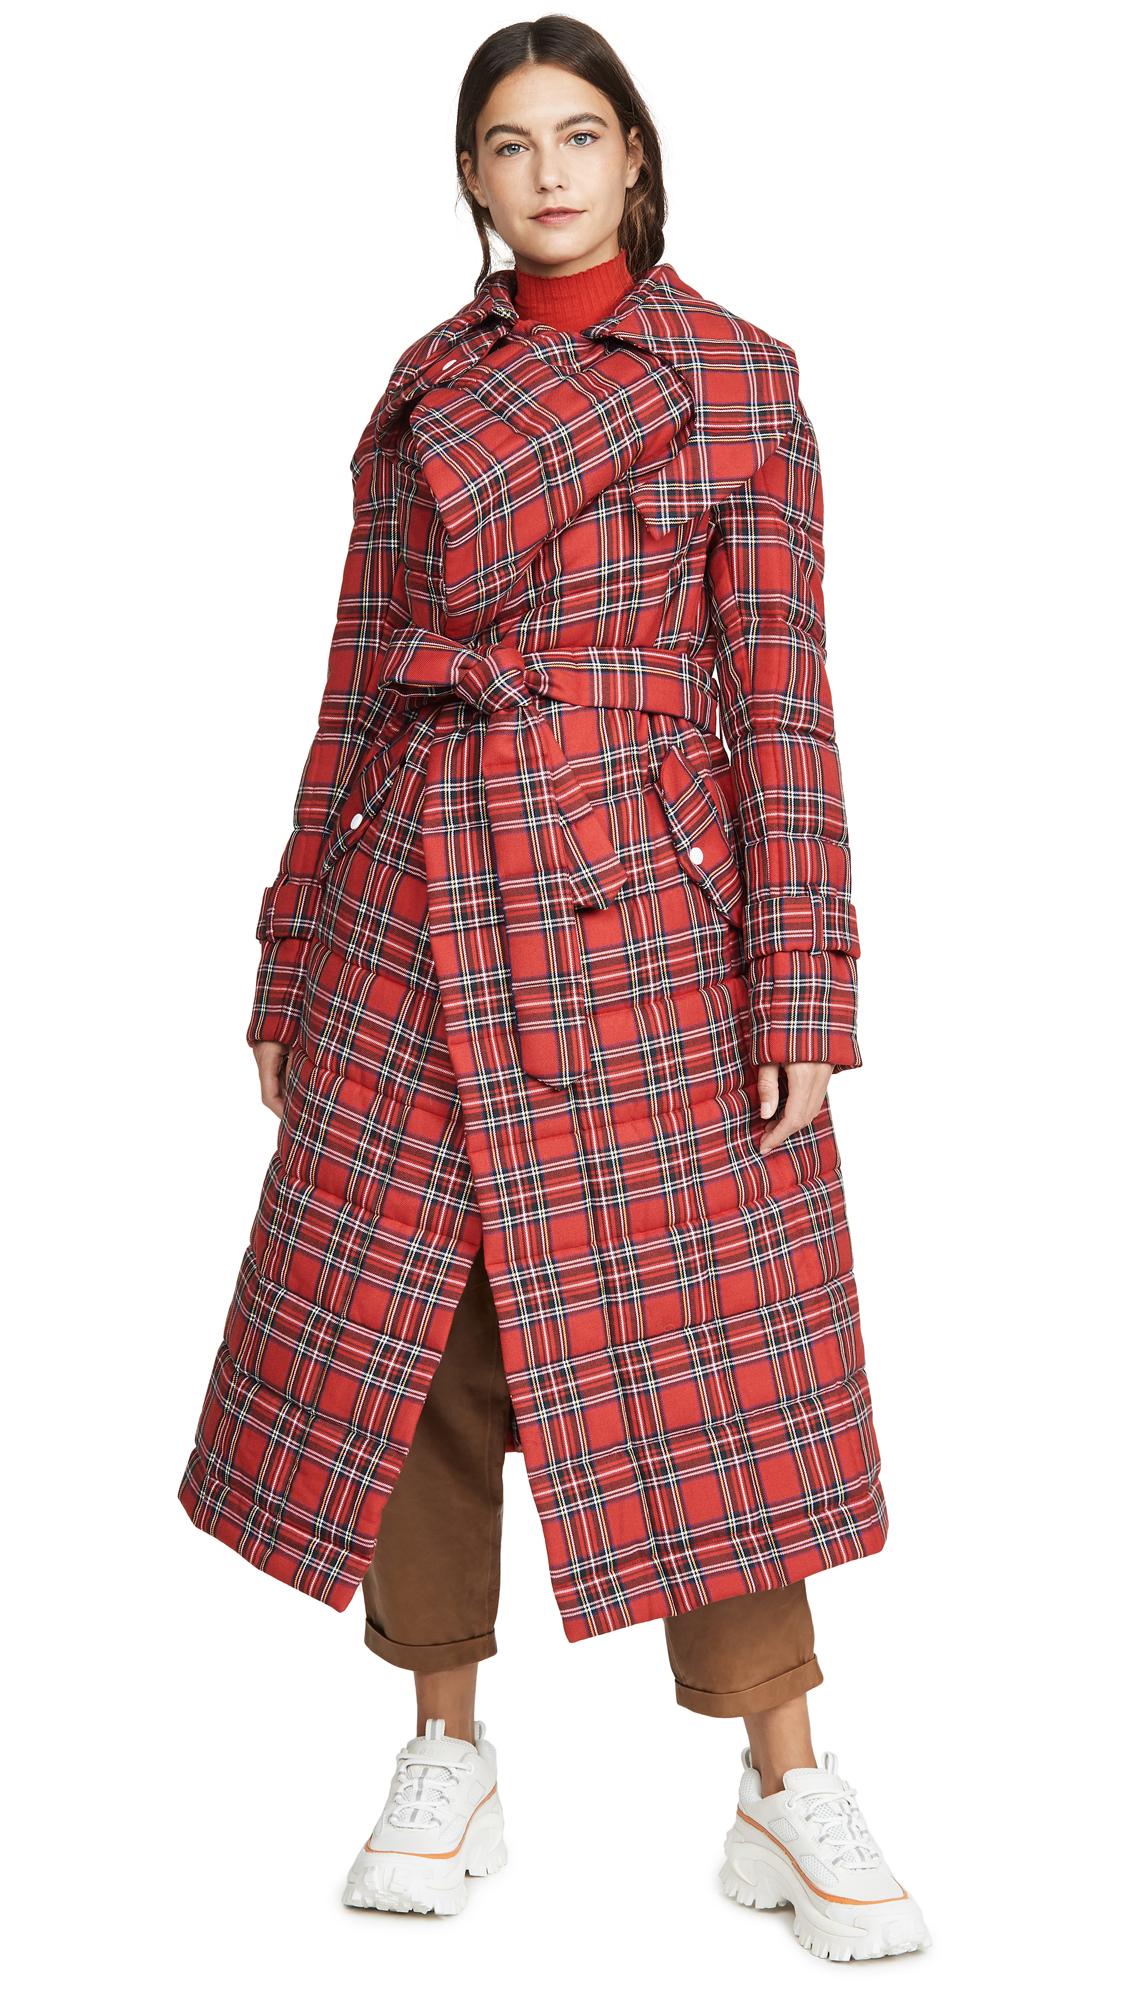 Buy A.W.A.K.E MODE Highlander Warm Secret Coat online beautiful A.W.A.K.E MODE Jackets, Coats, Trench Coats